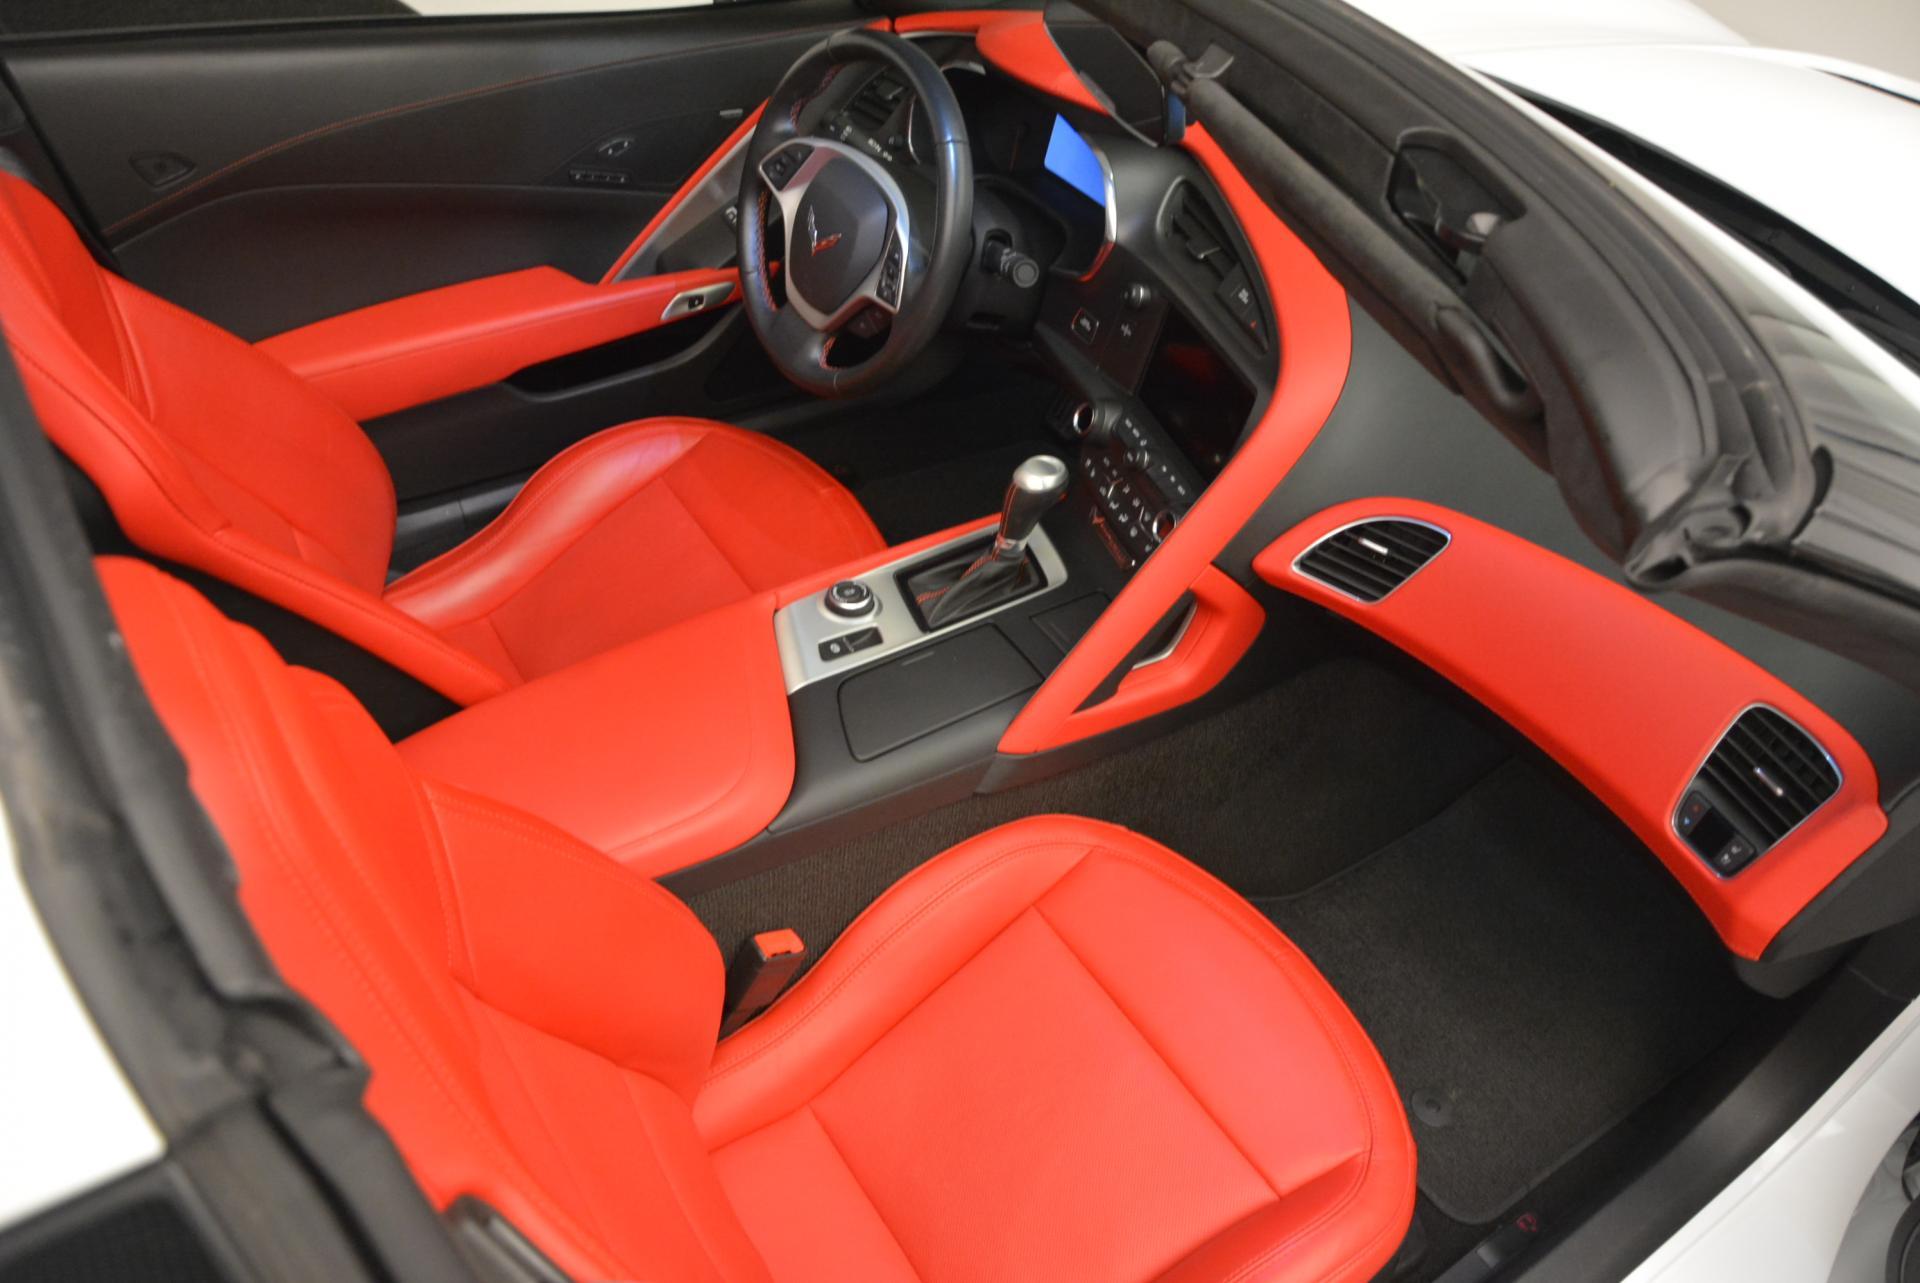 Used 2014 Chevrolet Corvette Stingray Z51 For Sale In Greenwich, CT 529_p18